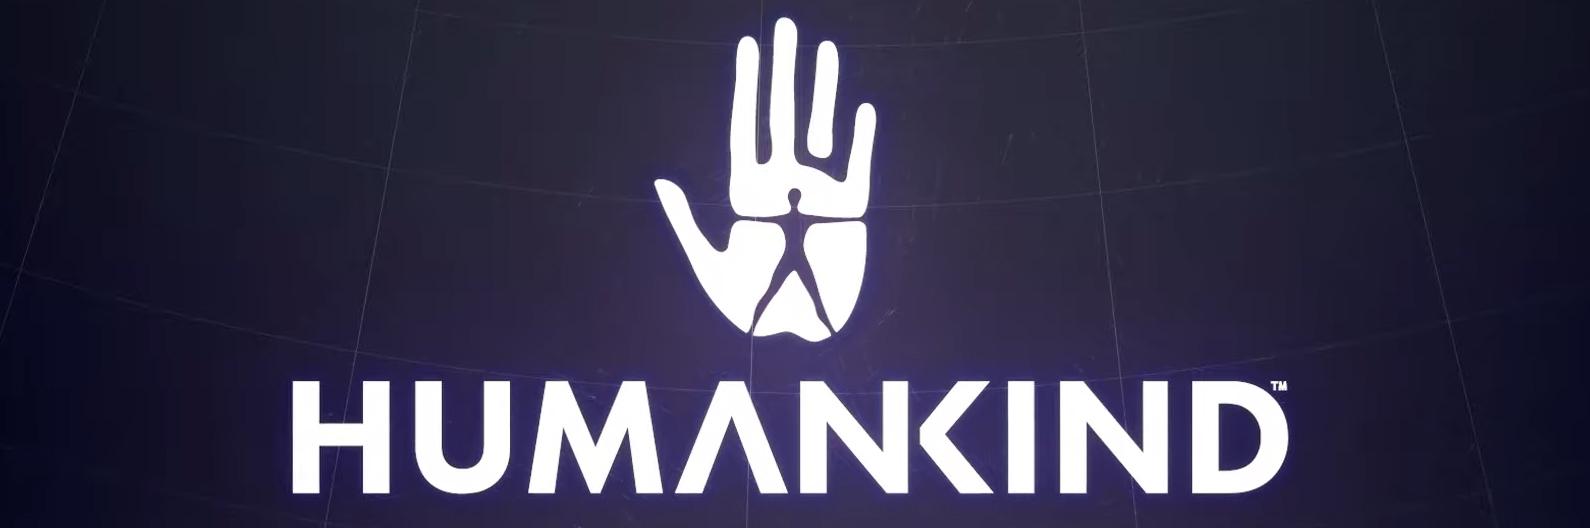 Humankind Title Image. Image Credit: Amplitude Studios/Sega.